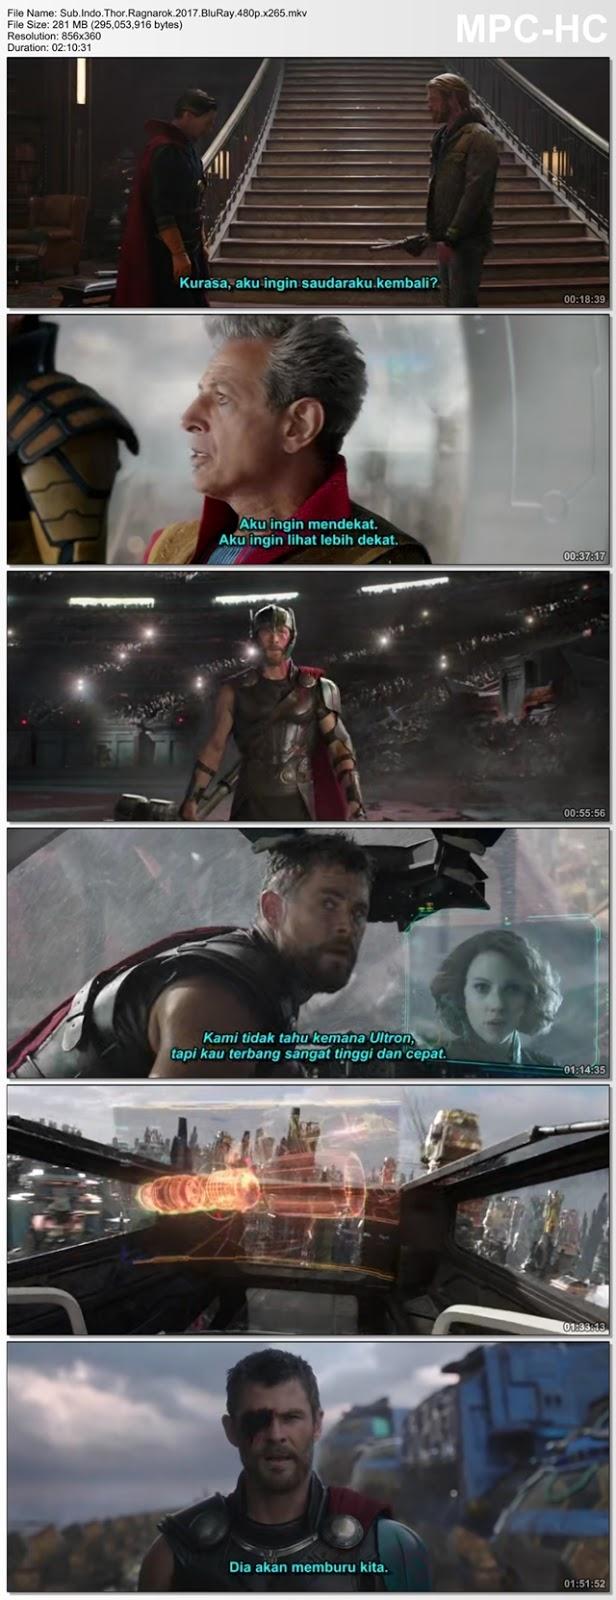 Screenshots Movie Sub.Indo.Thor.Ragnarok.2017.BluRay.480p.x265.mkv